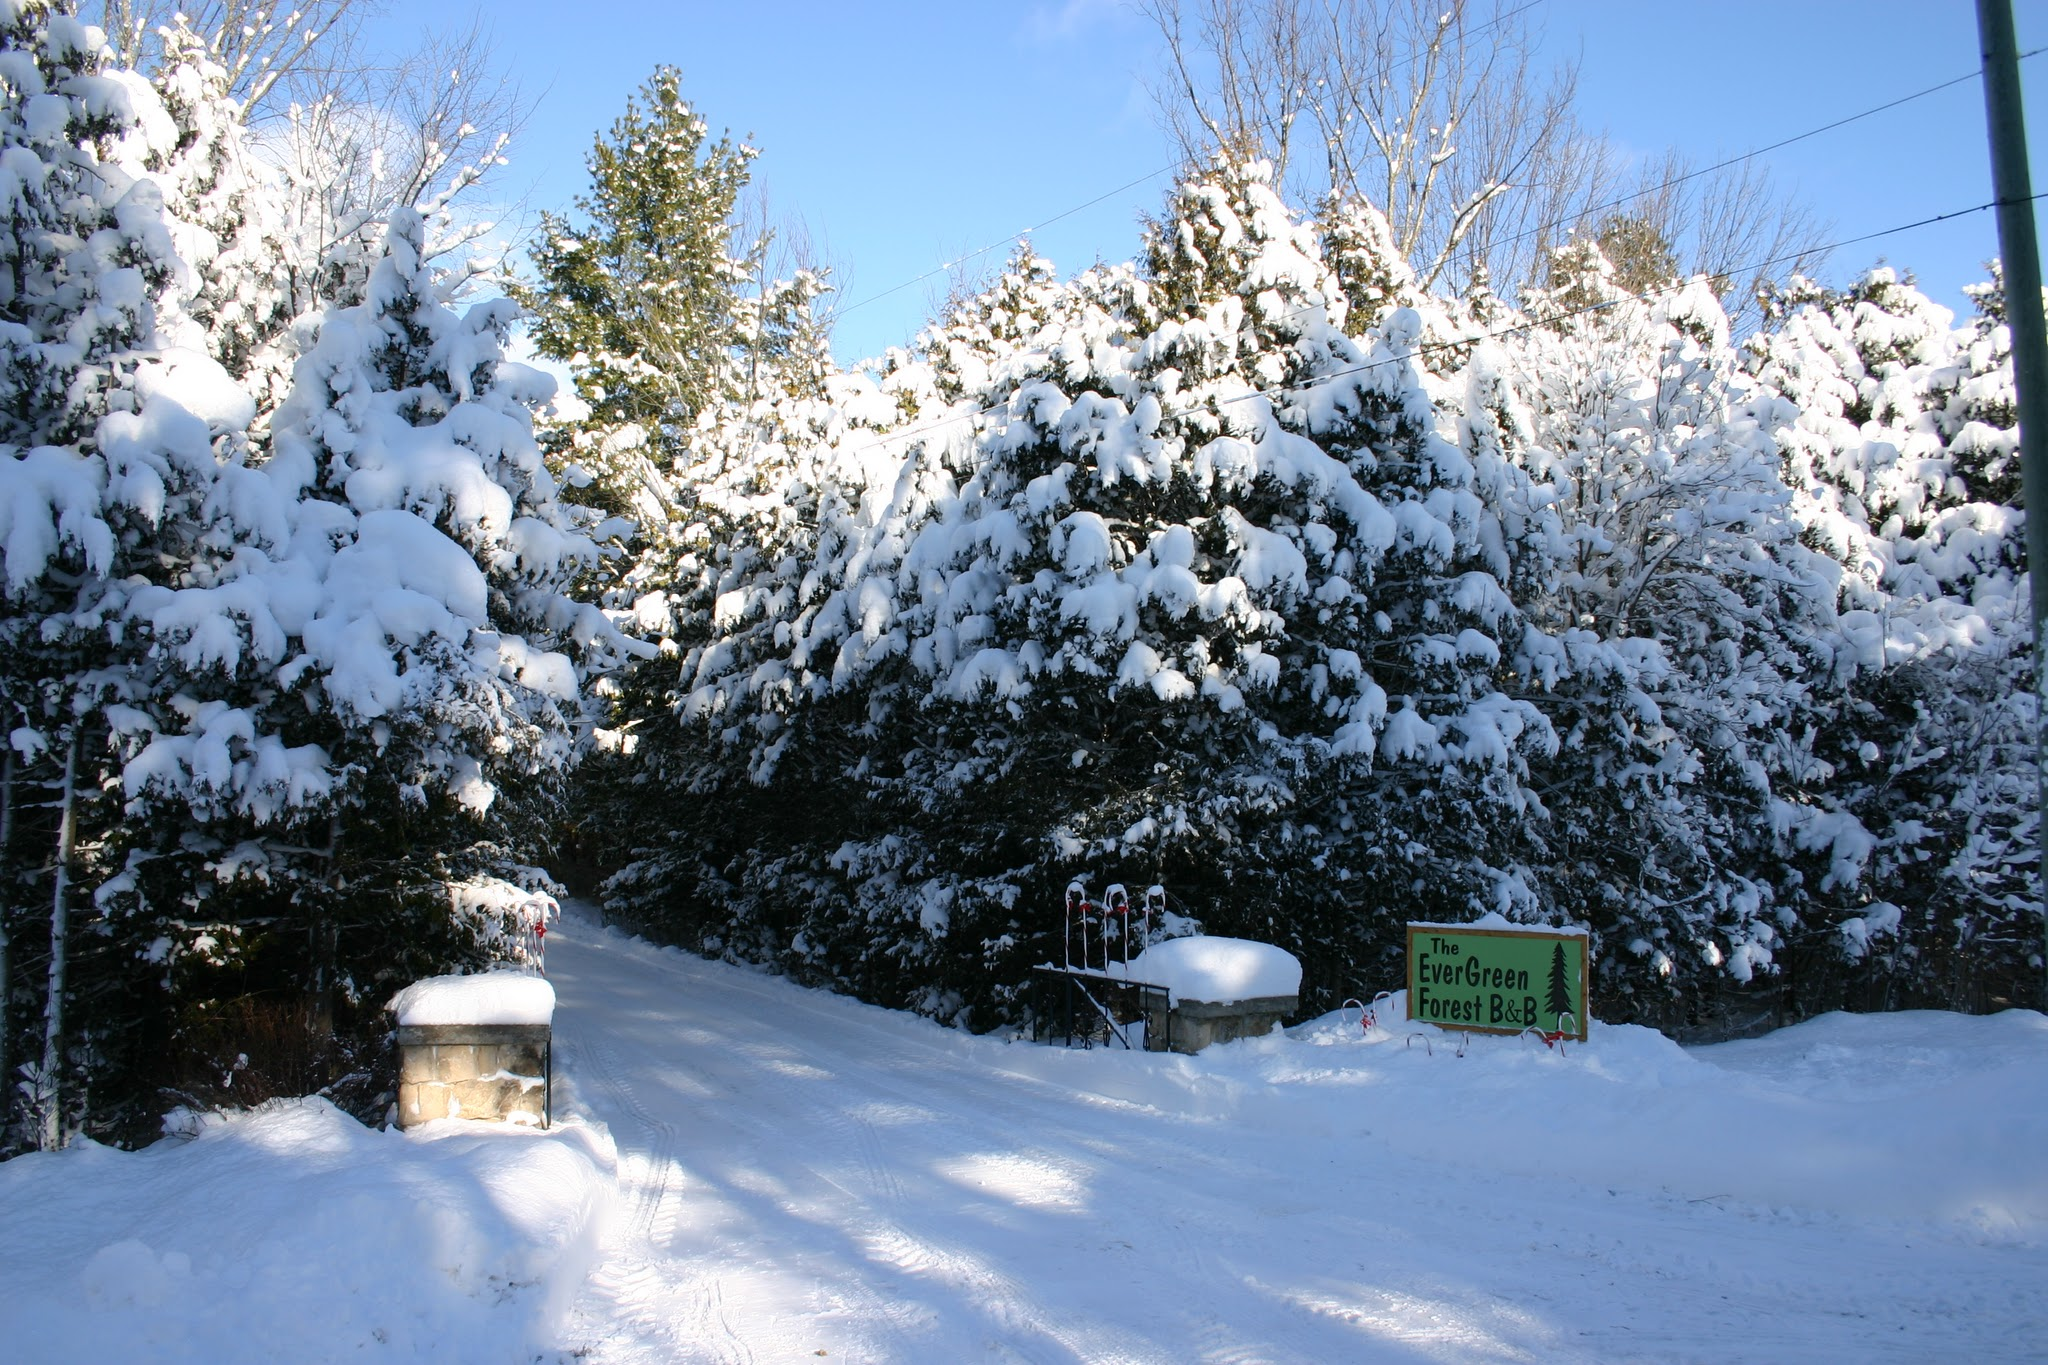 Photo: Entrance to Winter Playground